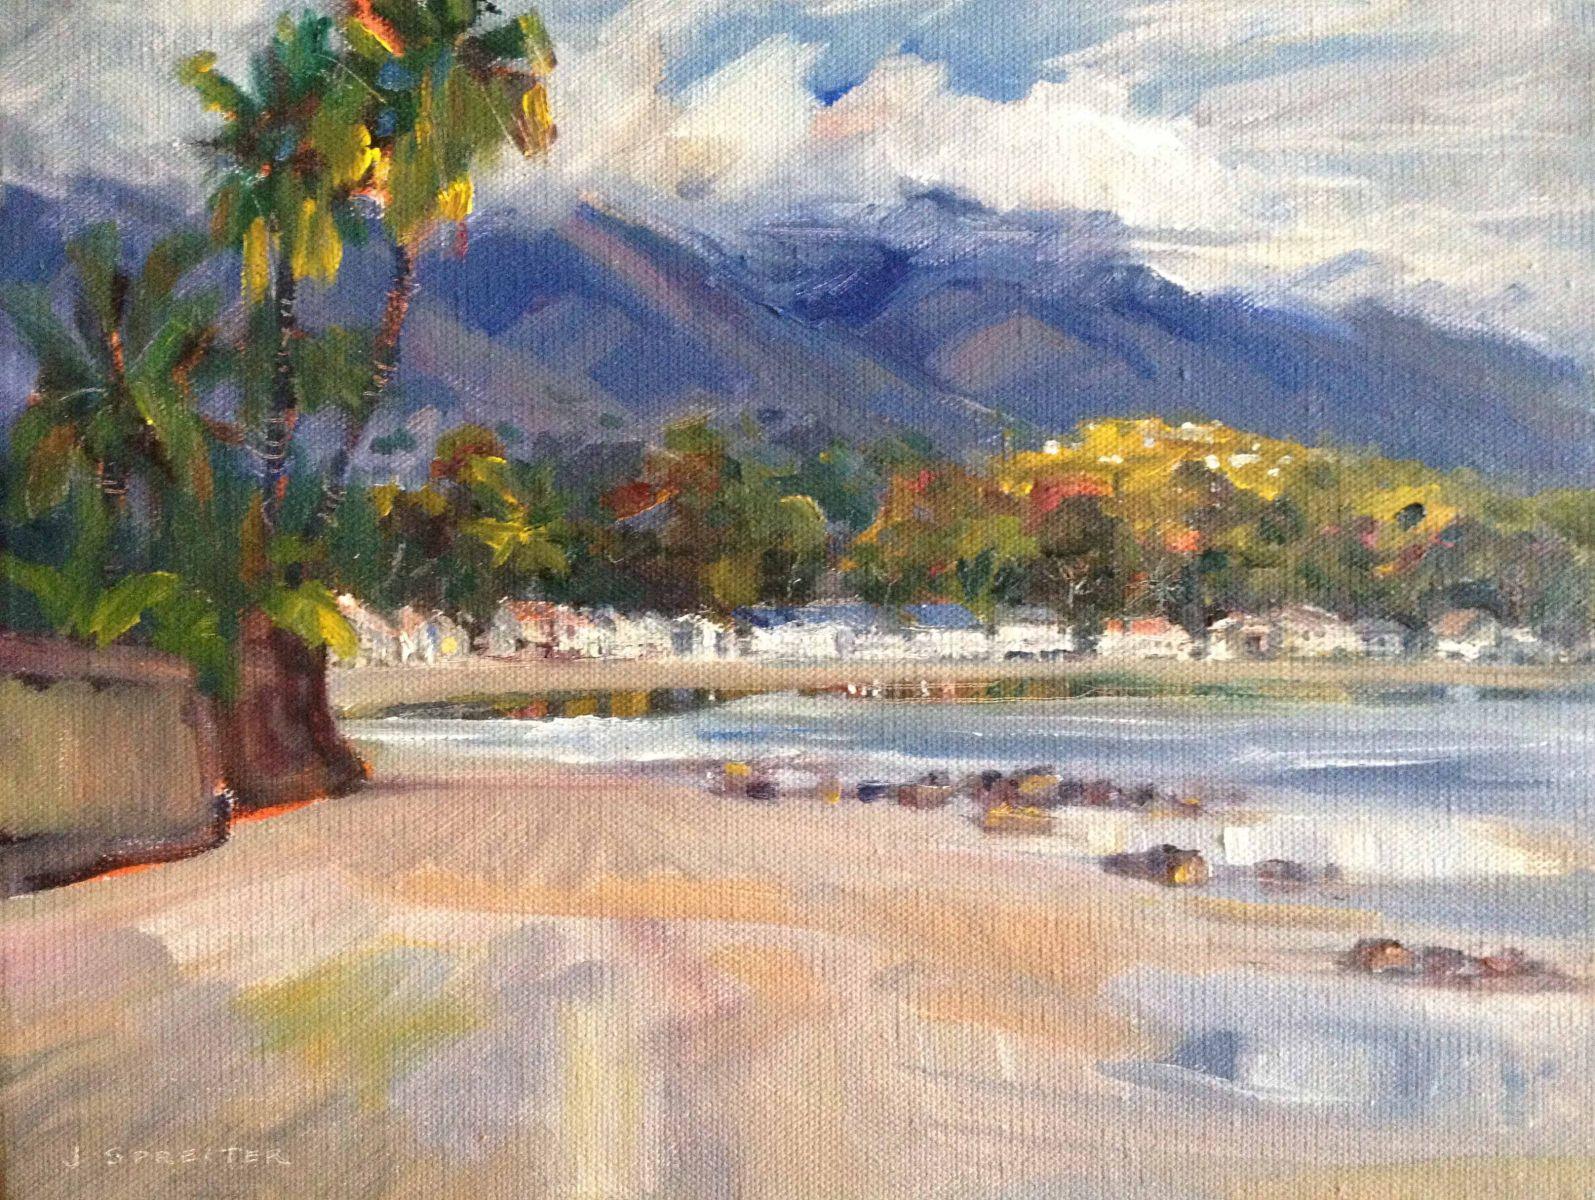 Miramar Beach After Rain, Santa Barbara